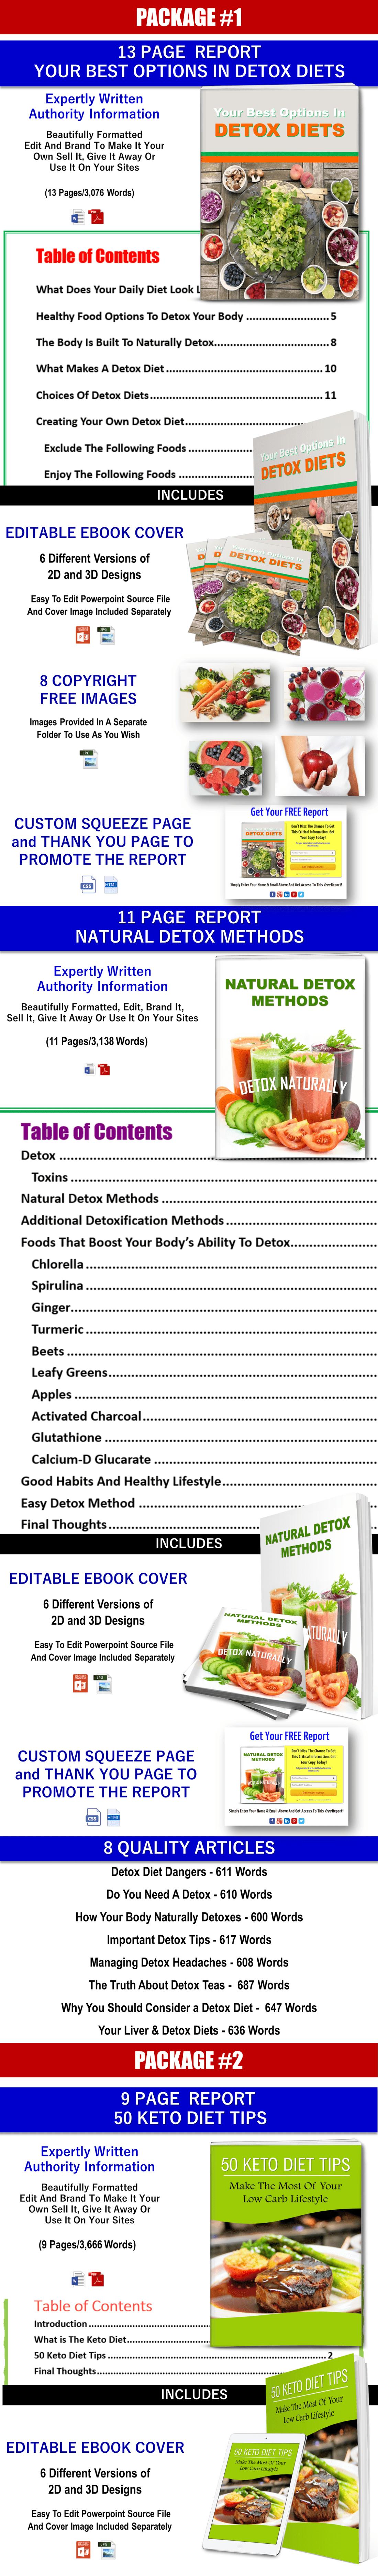 Giant Keto, Detox Diets. Metabolism And Health PLR